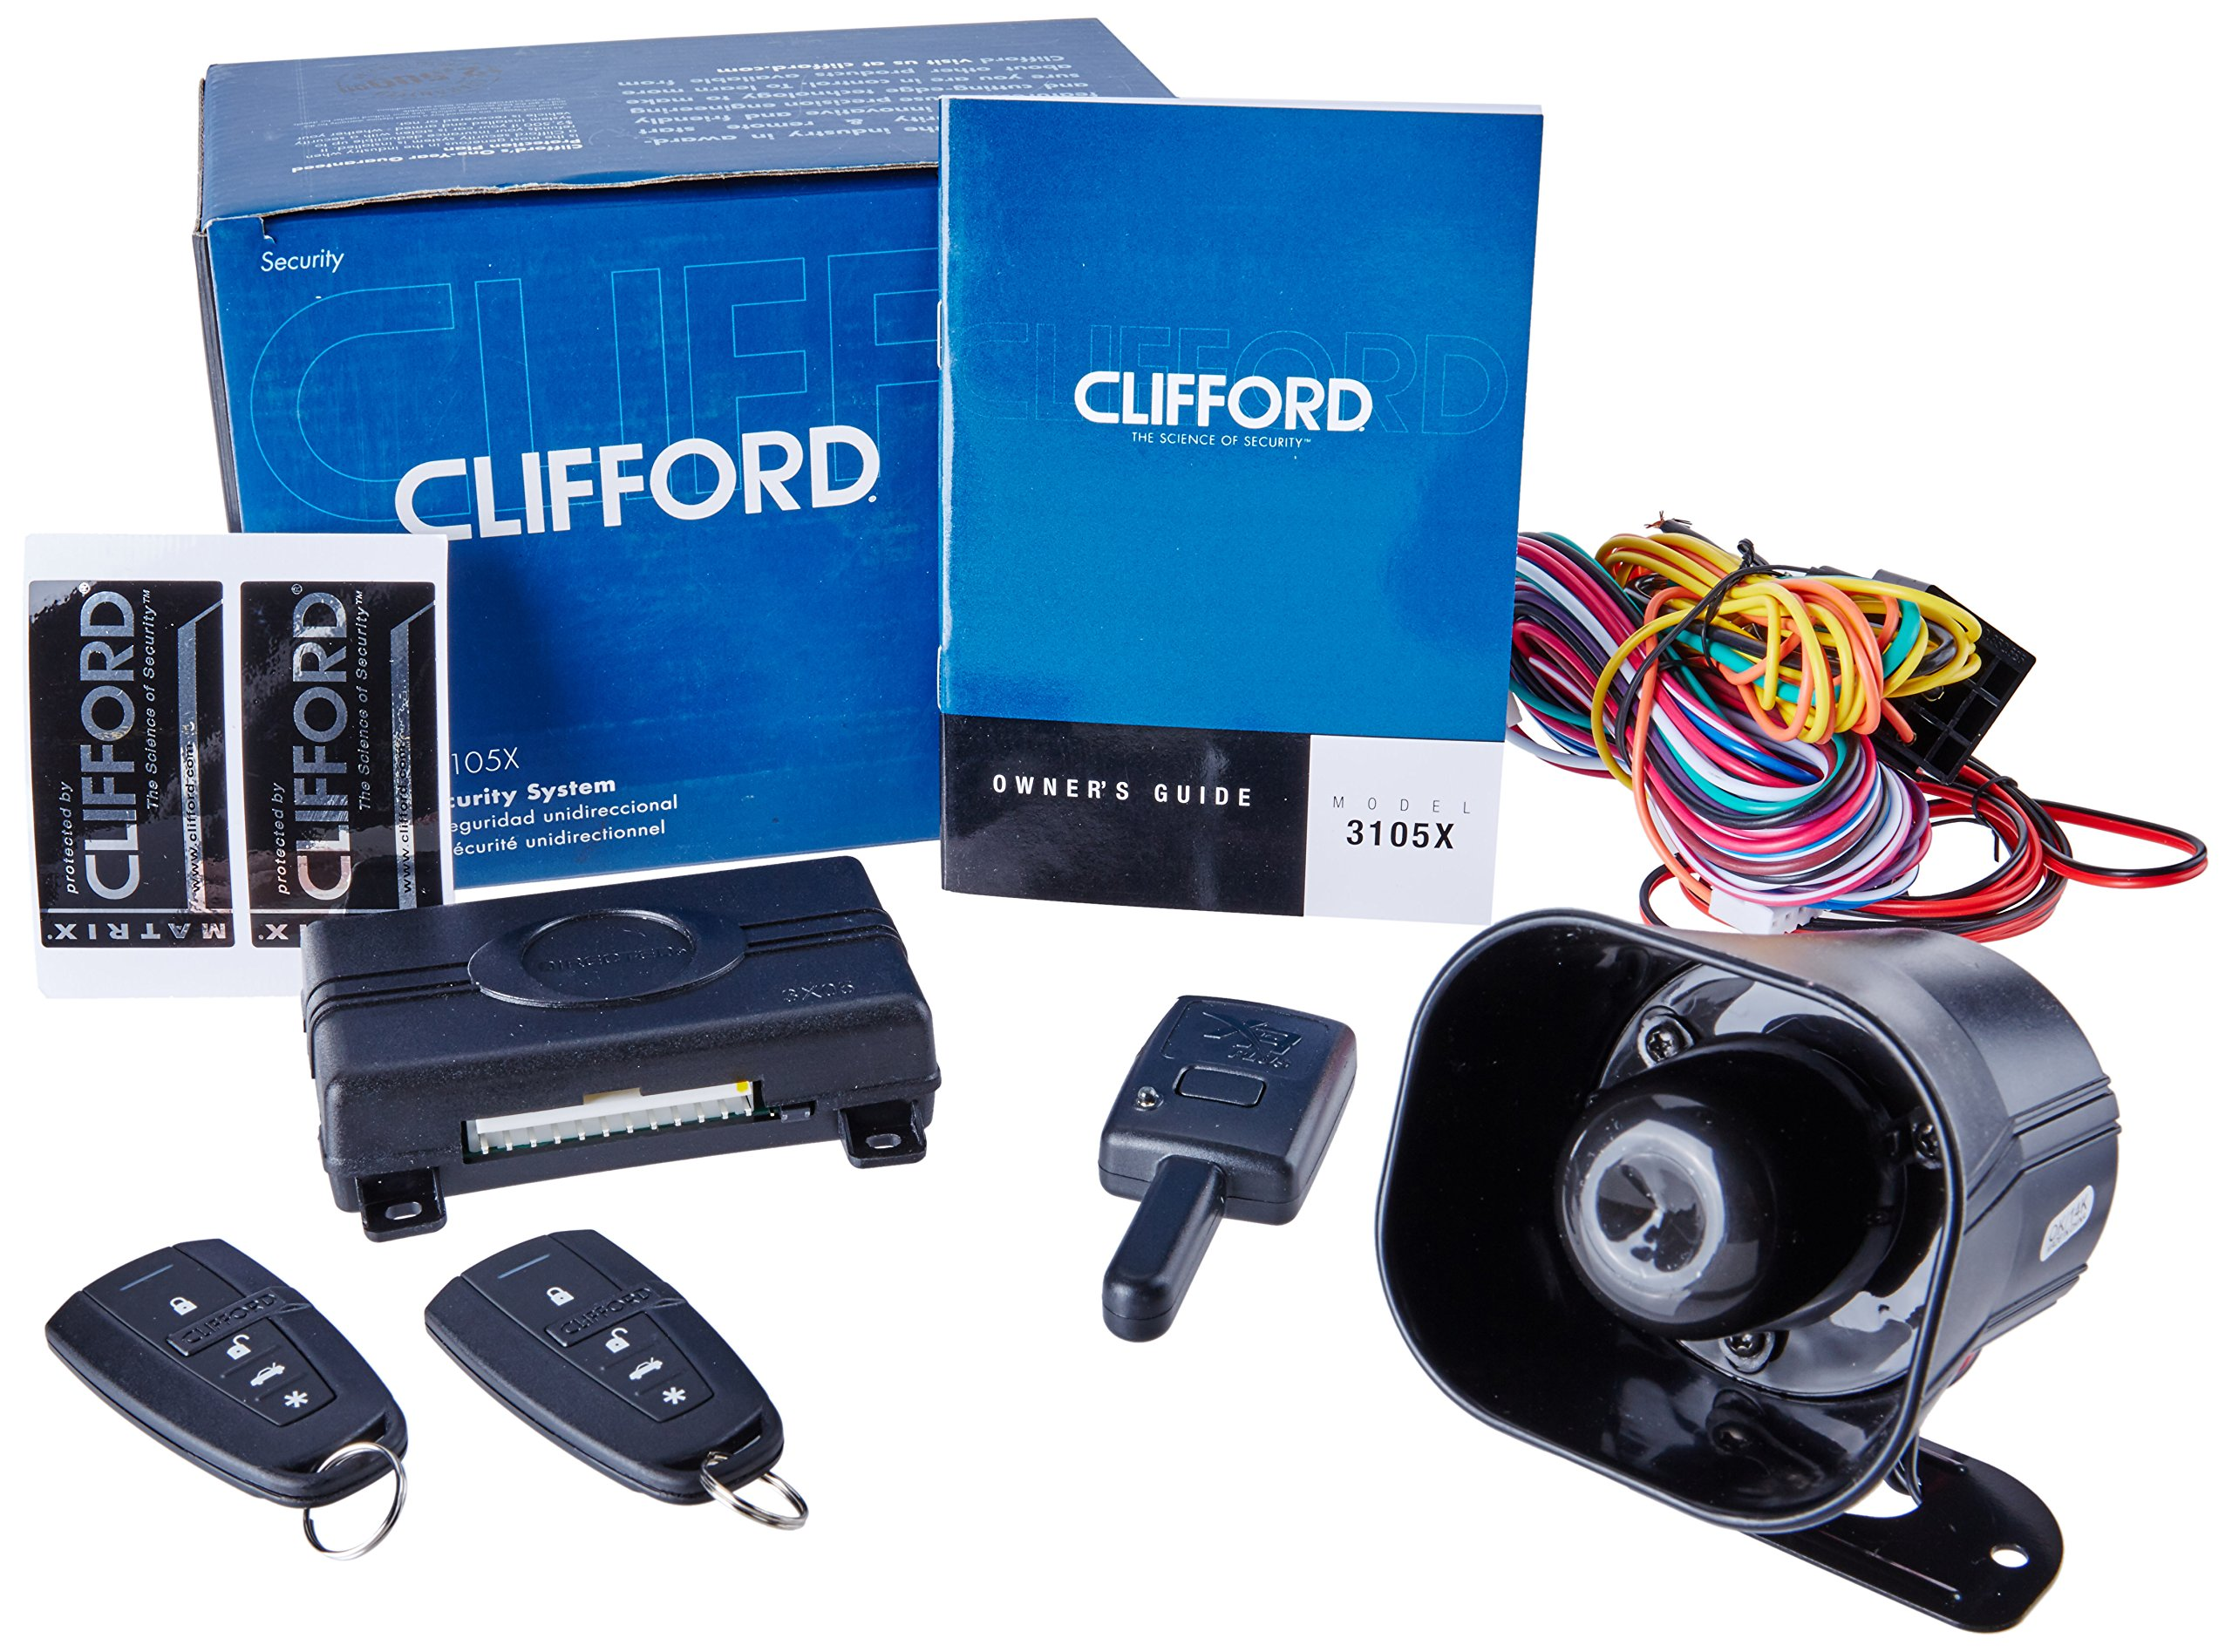 Clifford Matrix +1.2 1-Way Security Alarm System. by Clifford